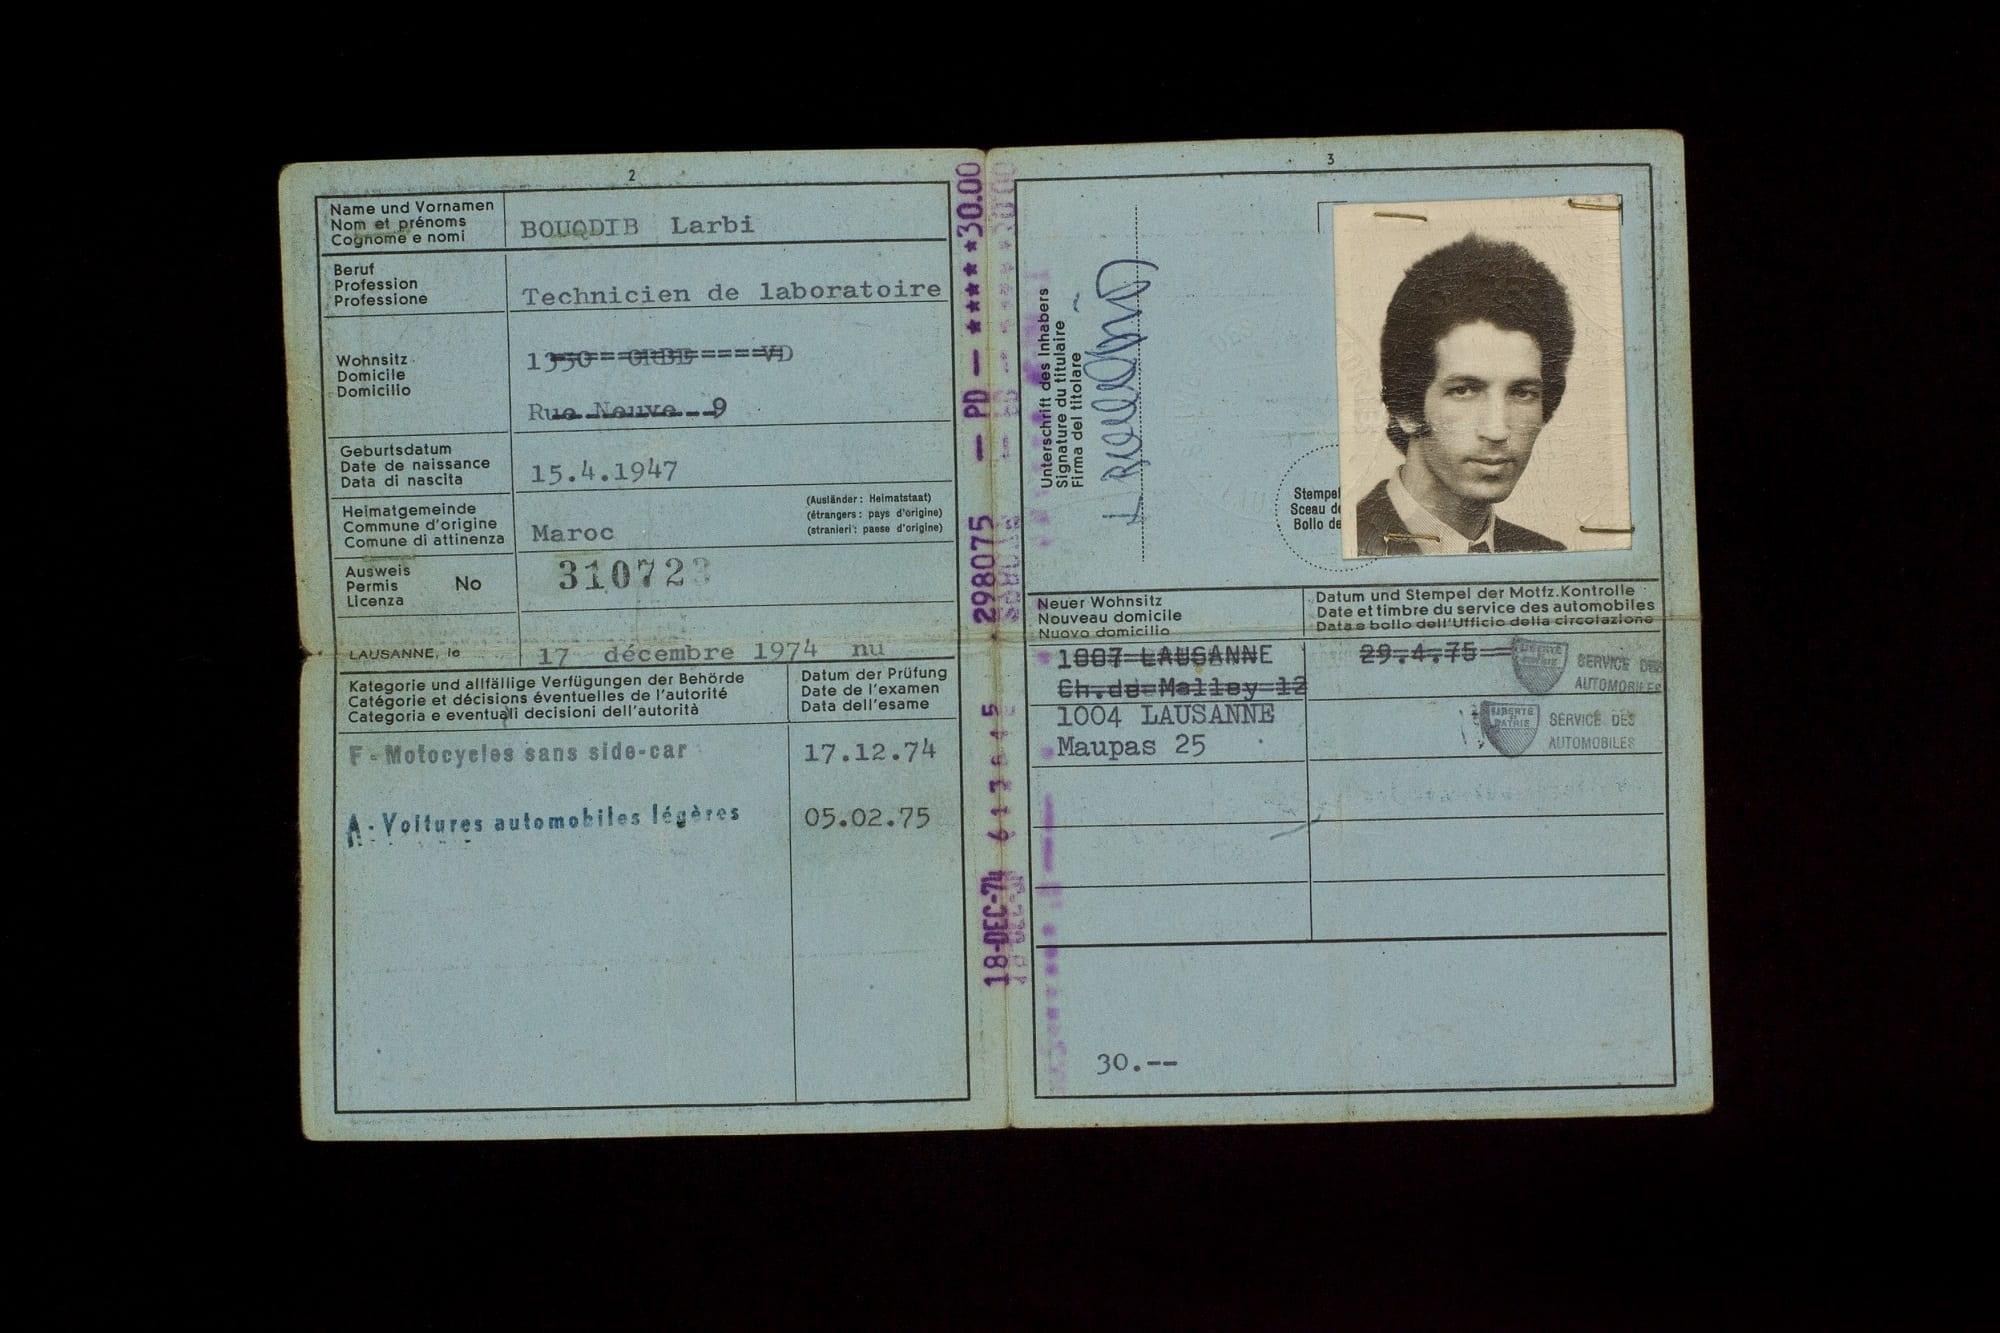 1-6 Führerausweis # 310723 | Permis de conduire # 310723 (17. Dezember 1974)